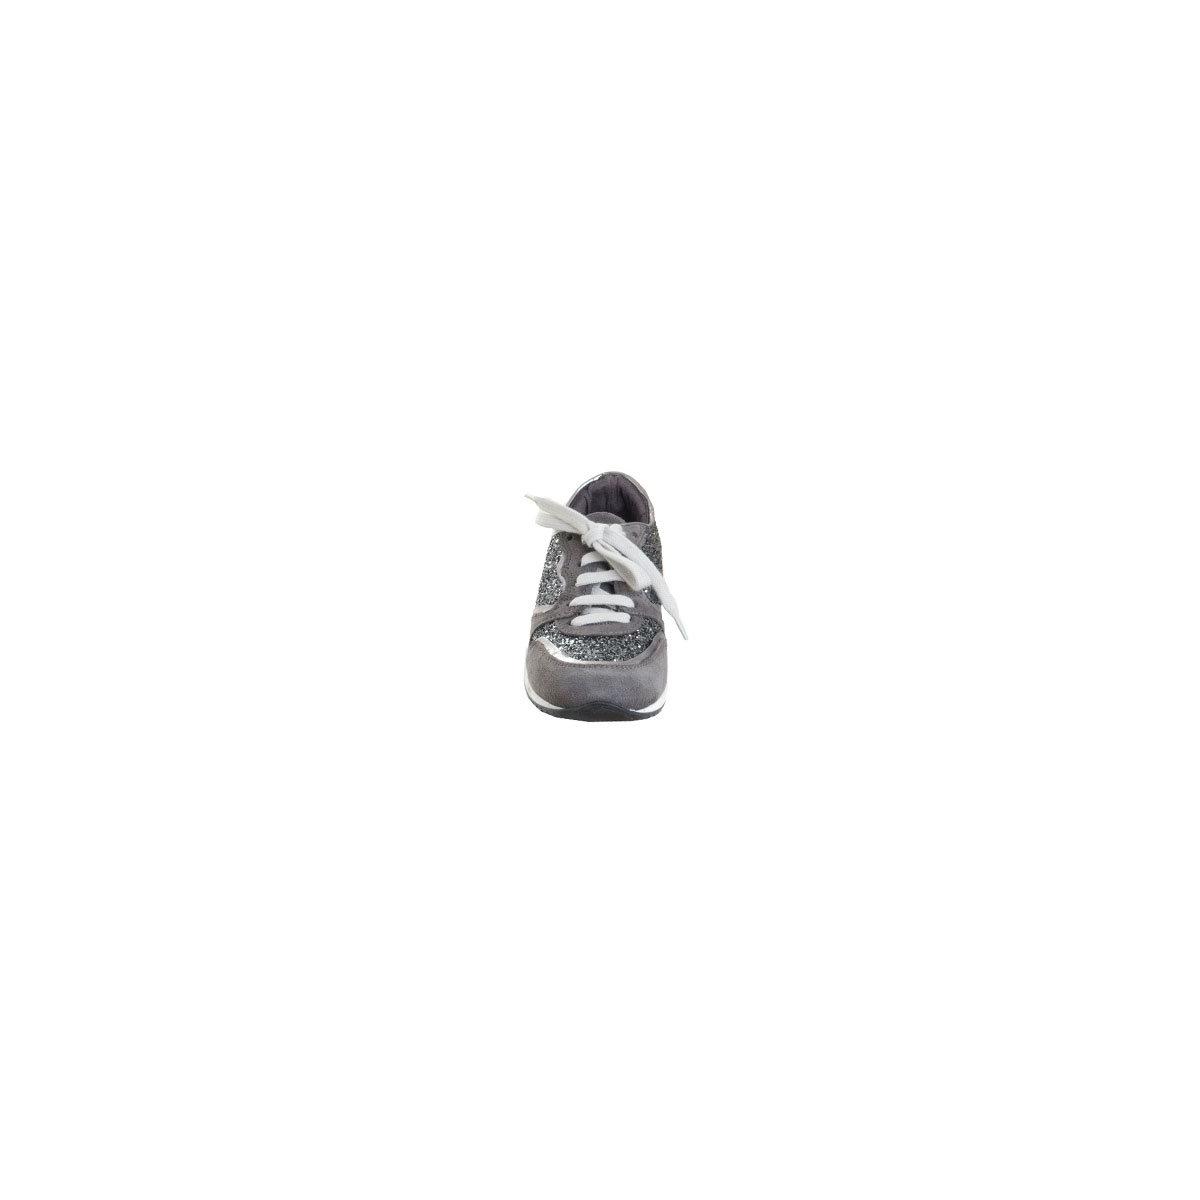 1-23620-35 1 tamaris sneaker grey/glitter